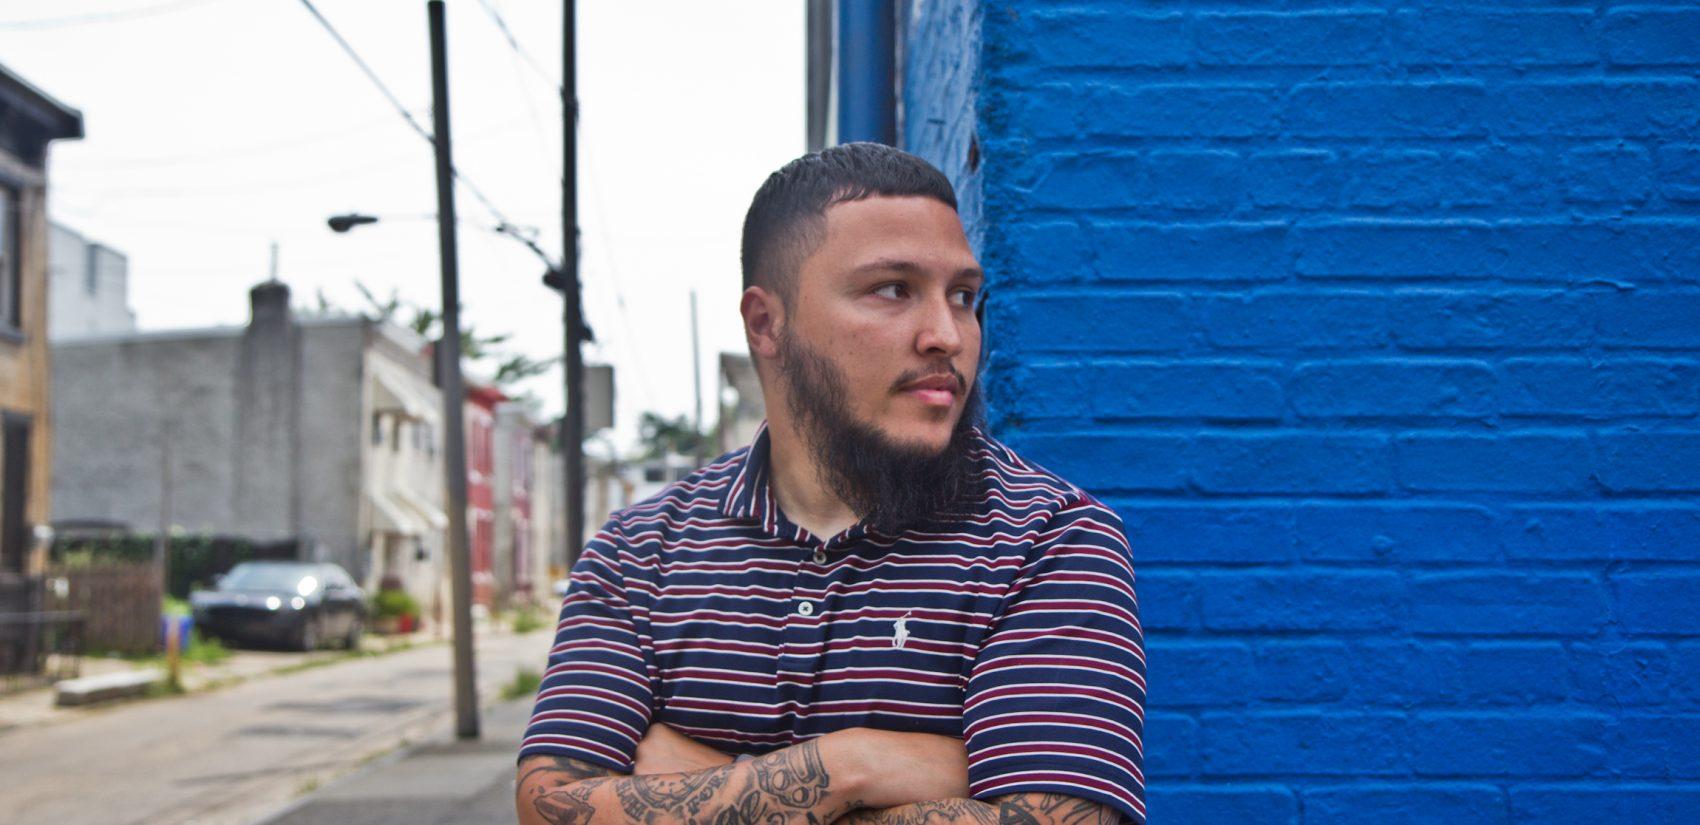 Ryan Rivera, former El Centro student. (Kimberly Paynter/Keystone Crossroads)